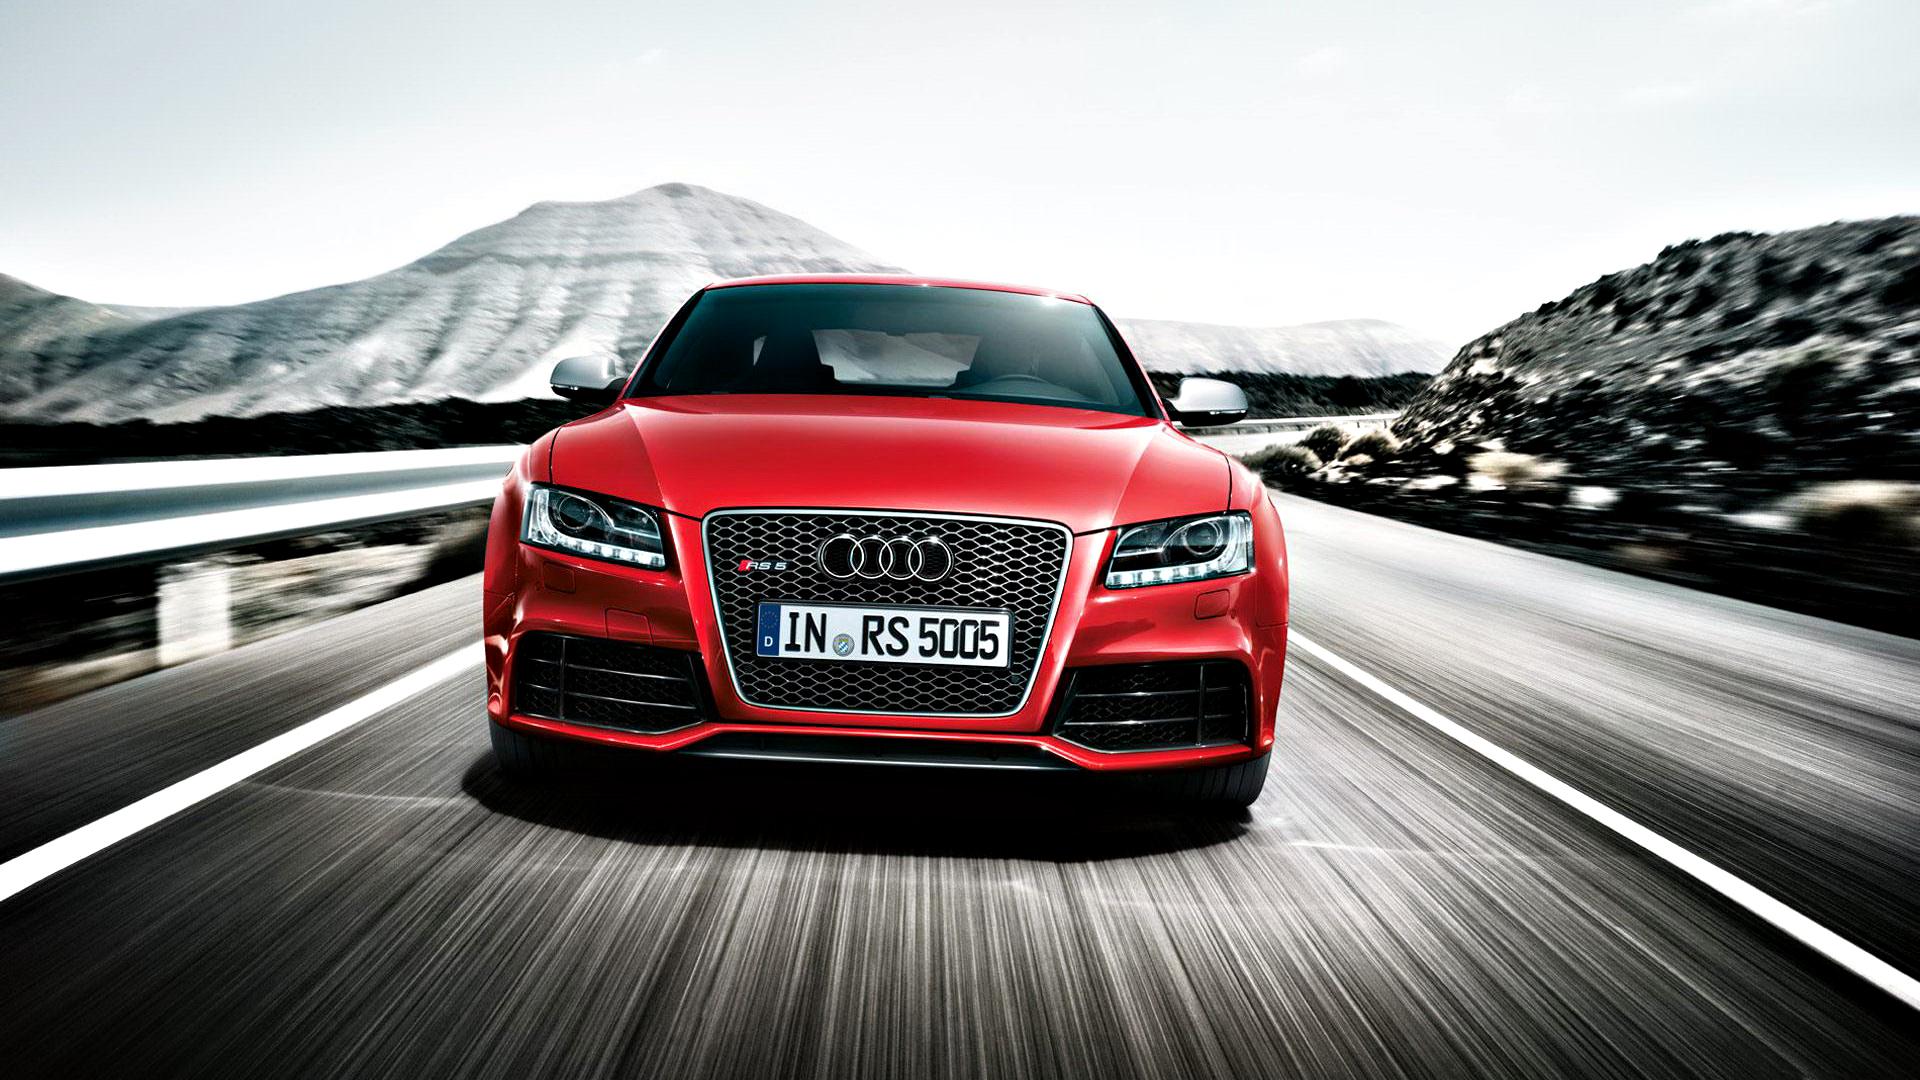 Audi Hd Wallpaper Background Image 1920x1080 Id147435